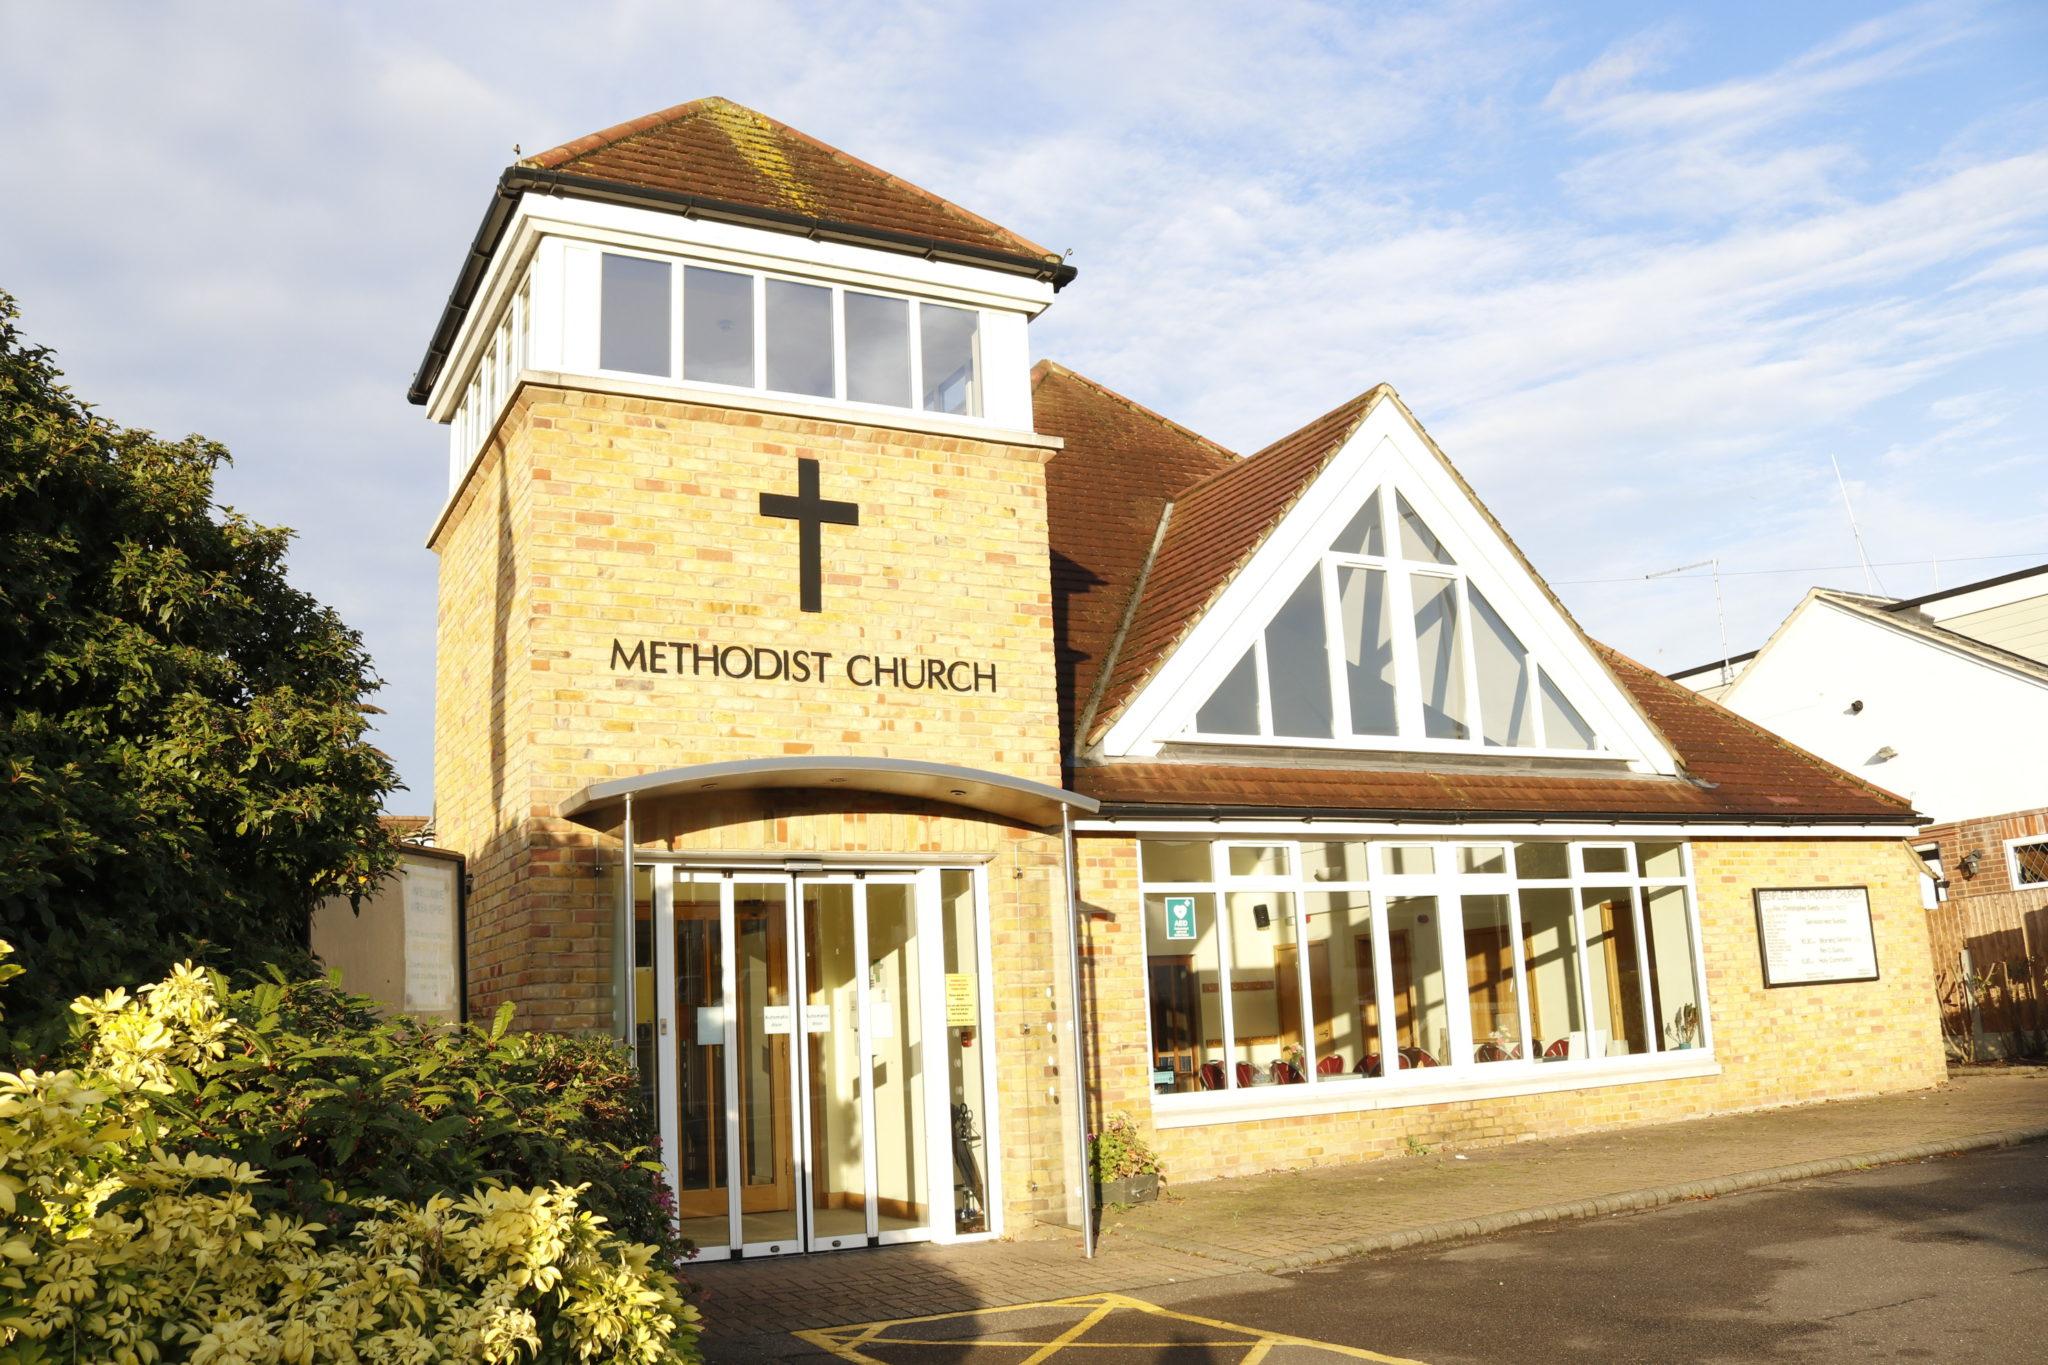 Benfleet Methodist Church - Today